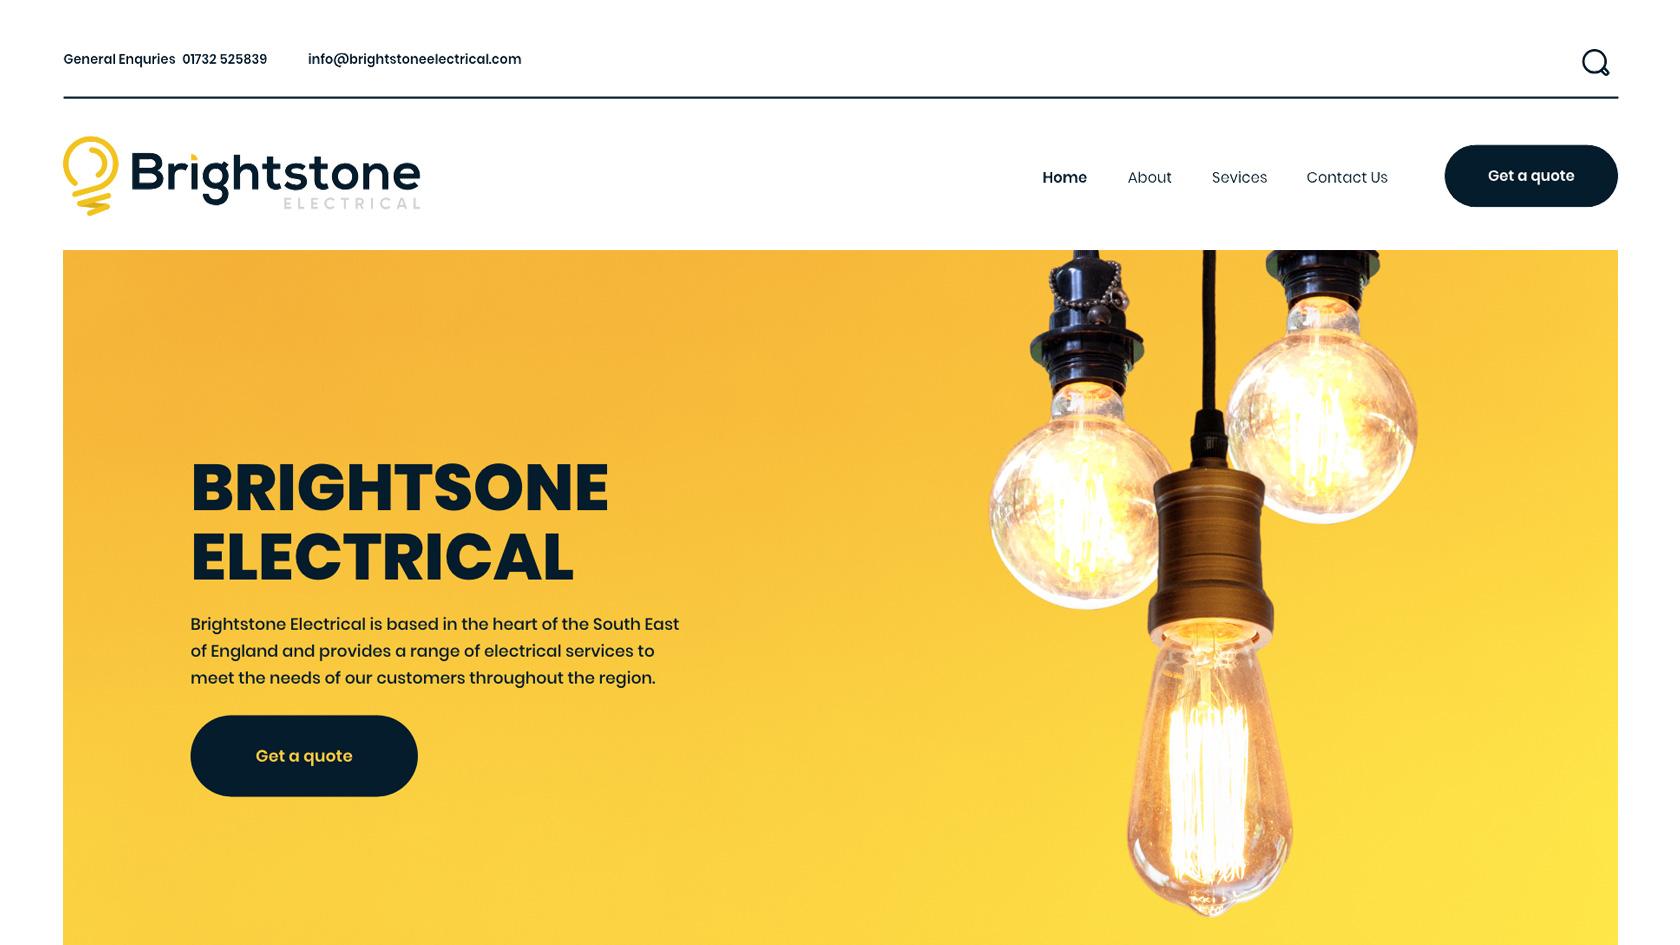 Brightstone-Website-Design-1